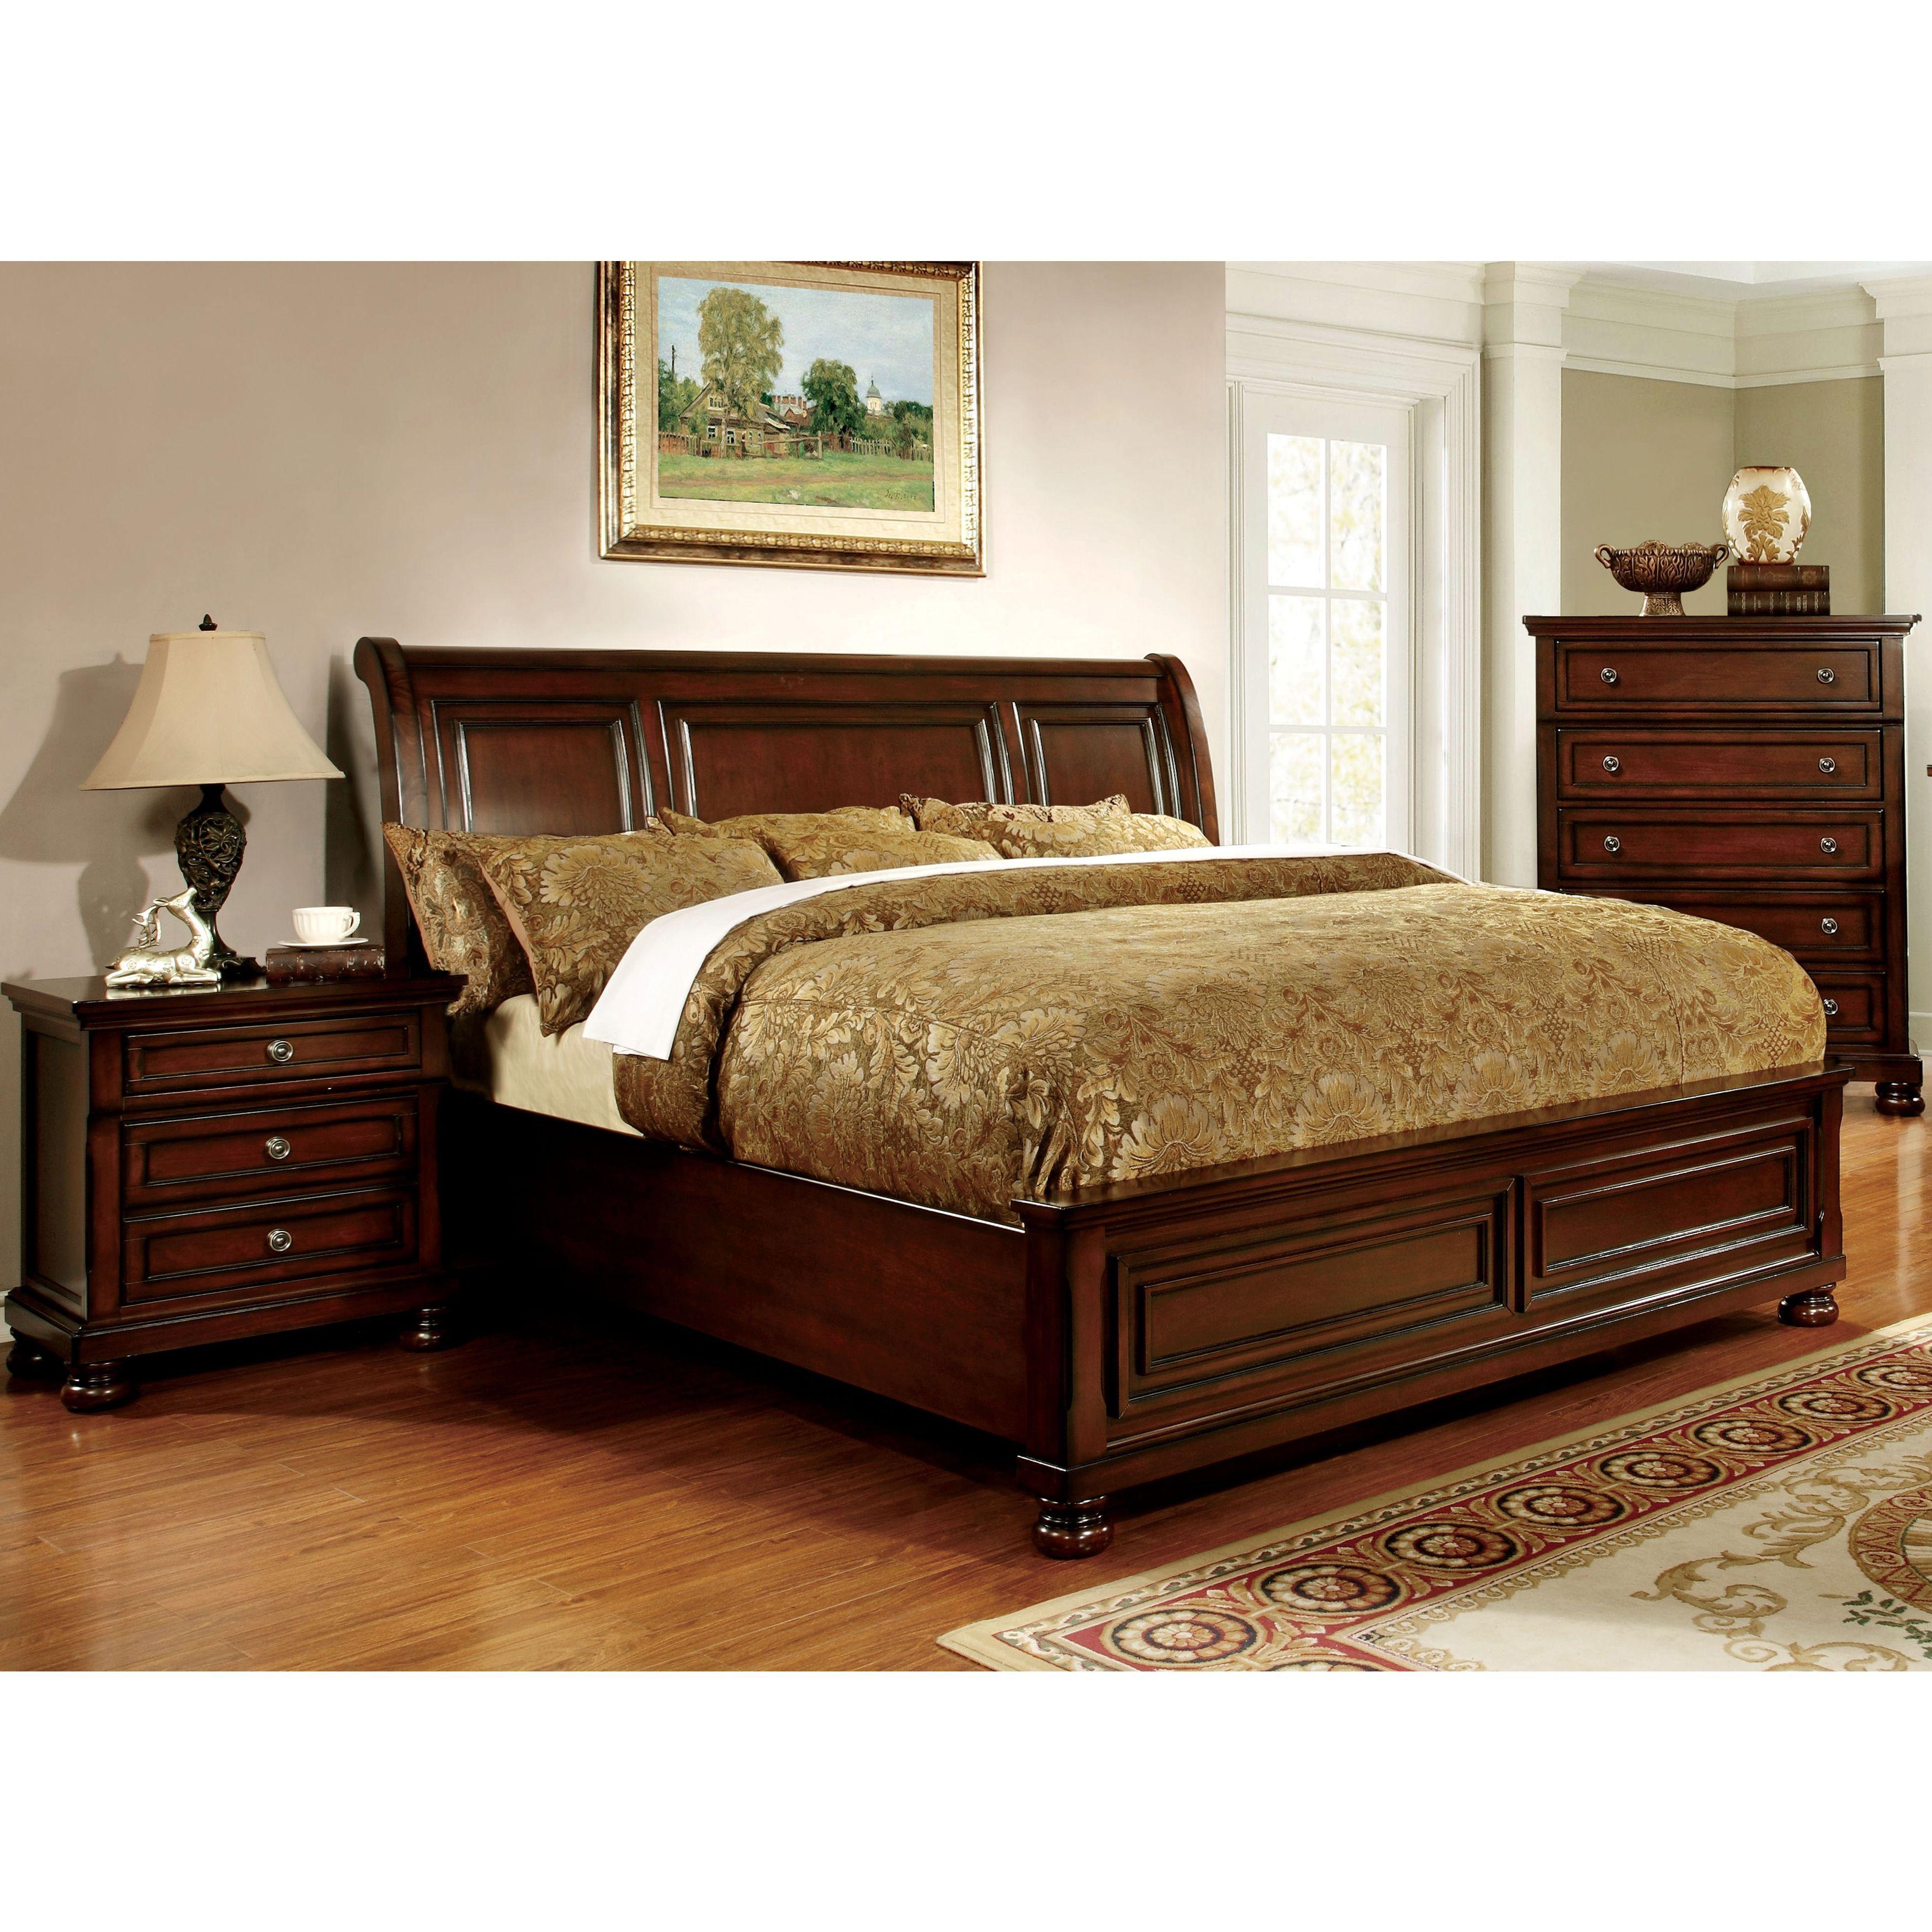 Furniture Of America Barelle Ii Cherry Paneled Bed